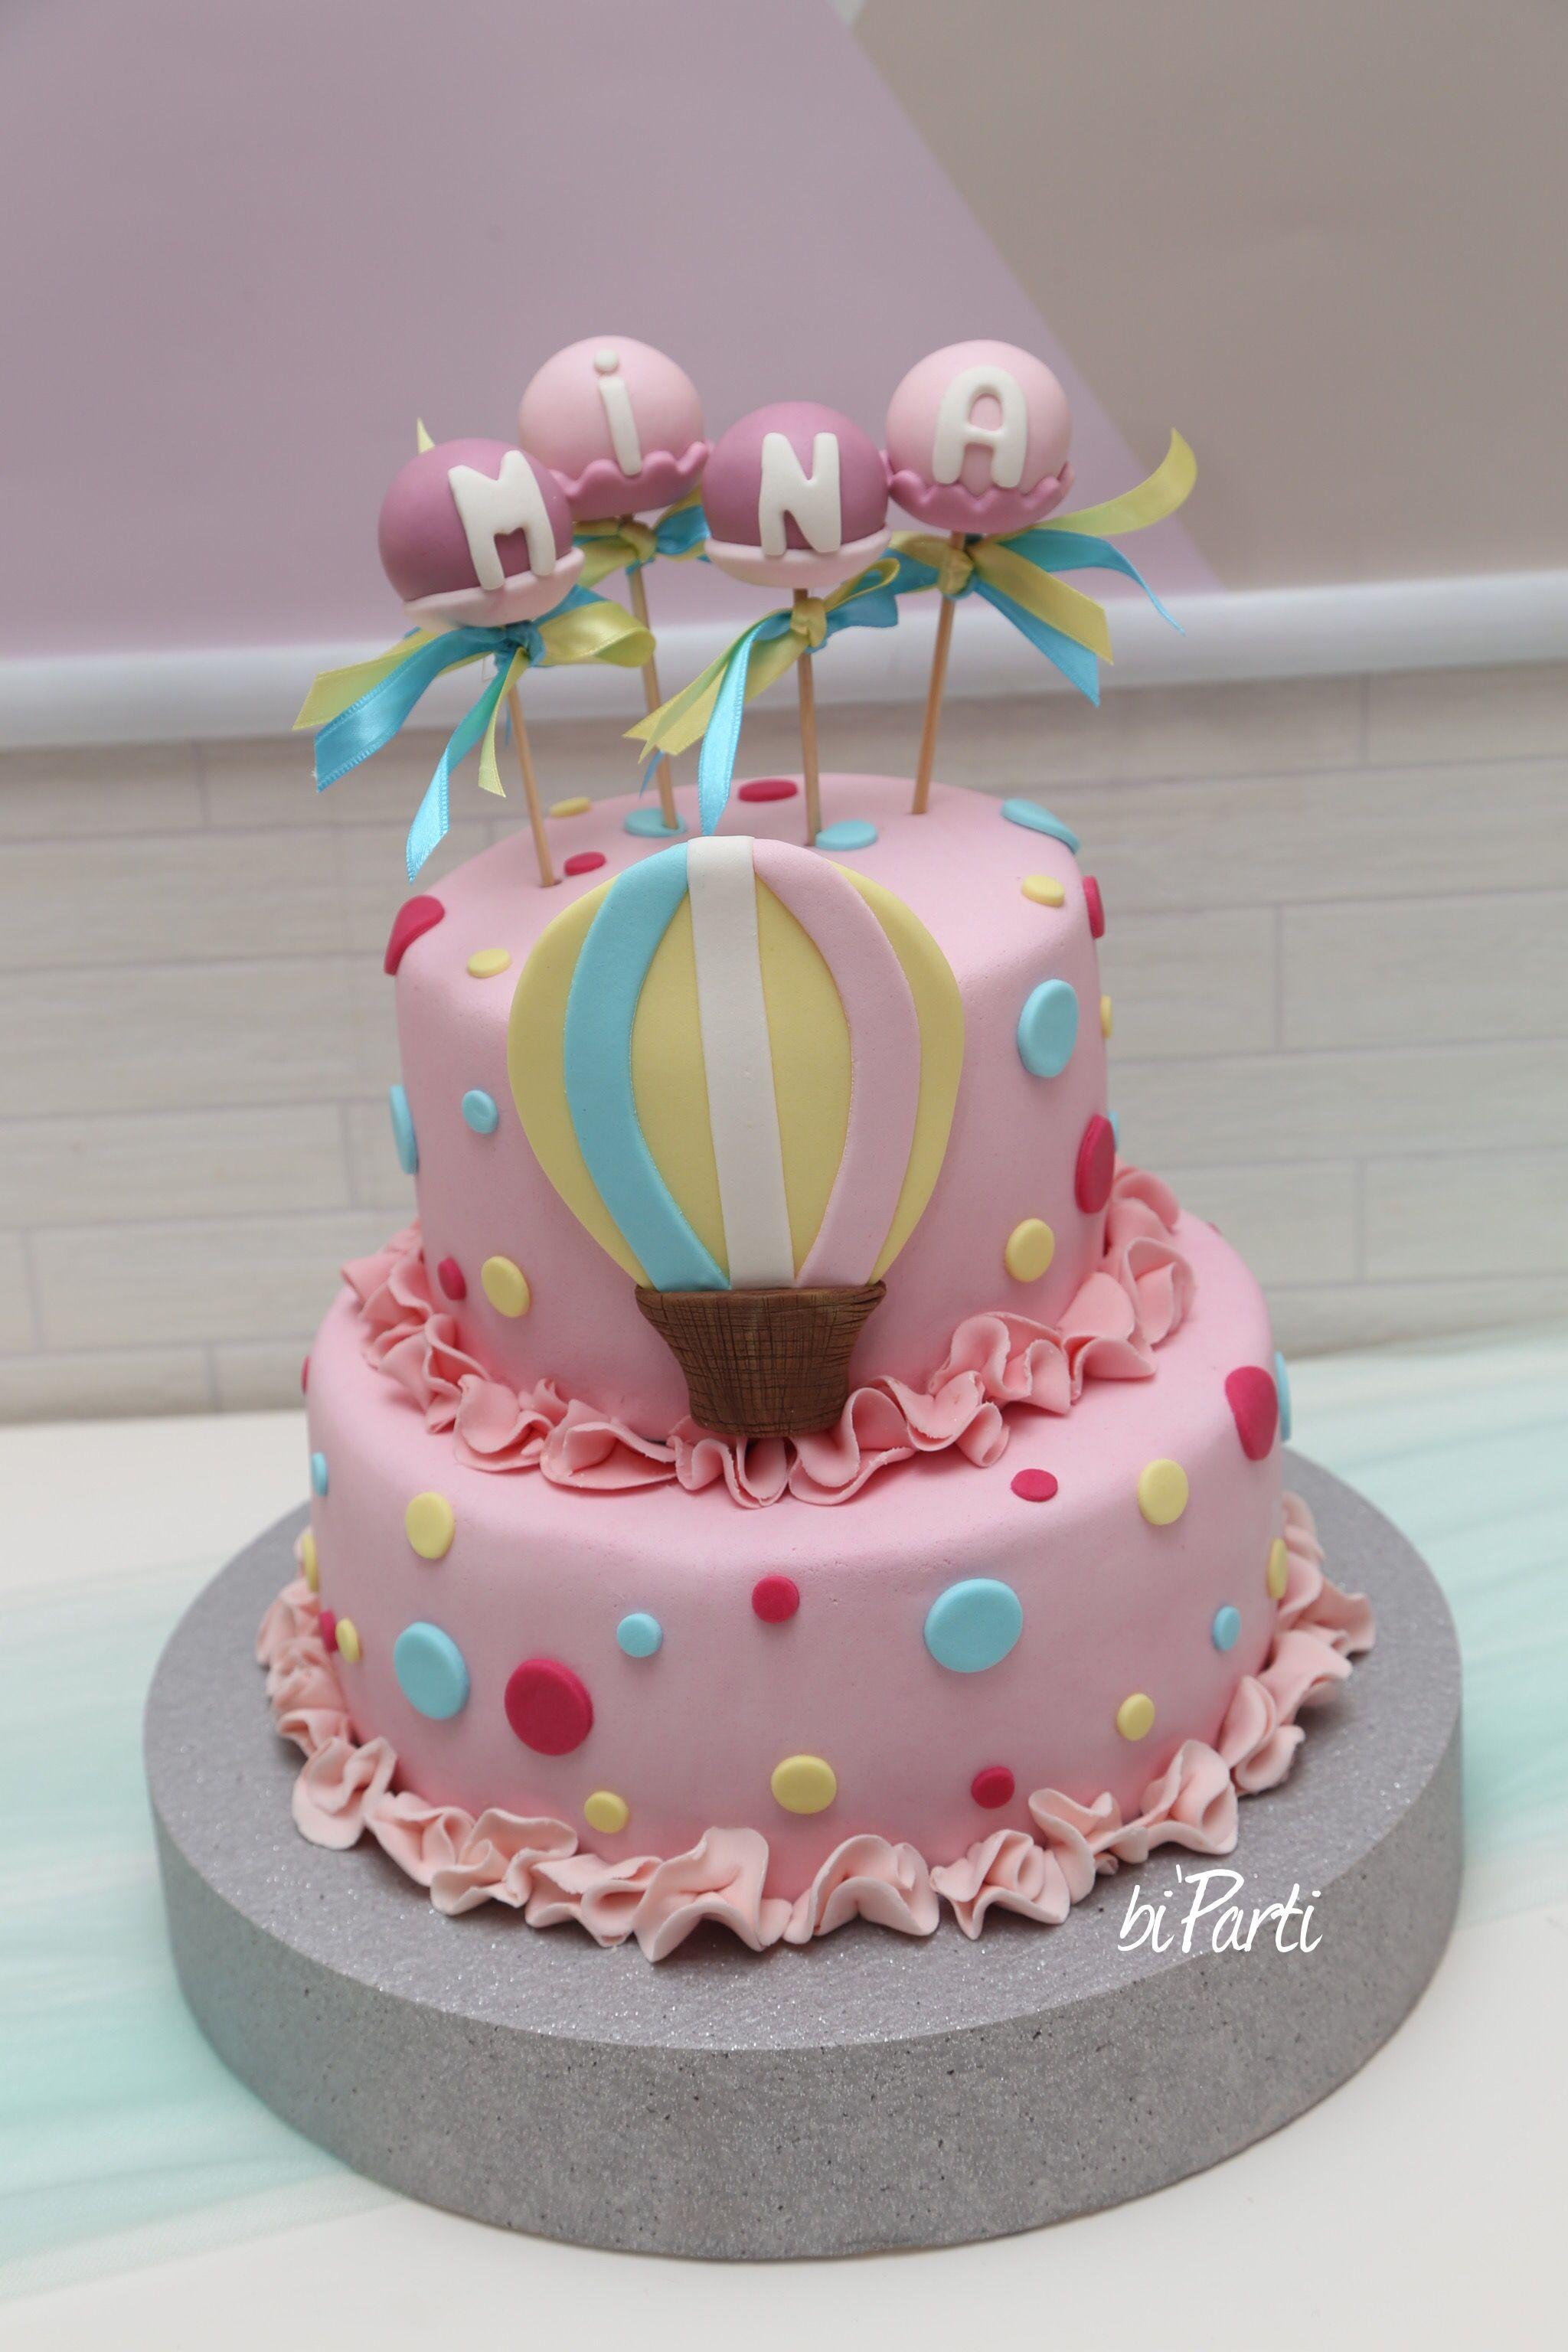 Baby Shower Cake Baby Girl Cake Welcome Baby Cake Balloon